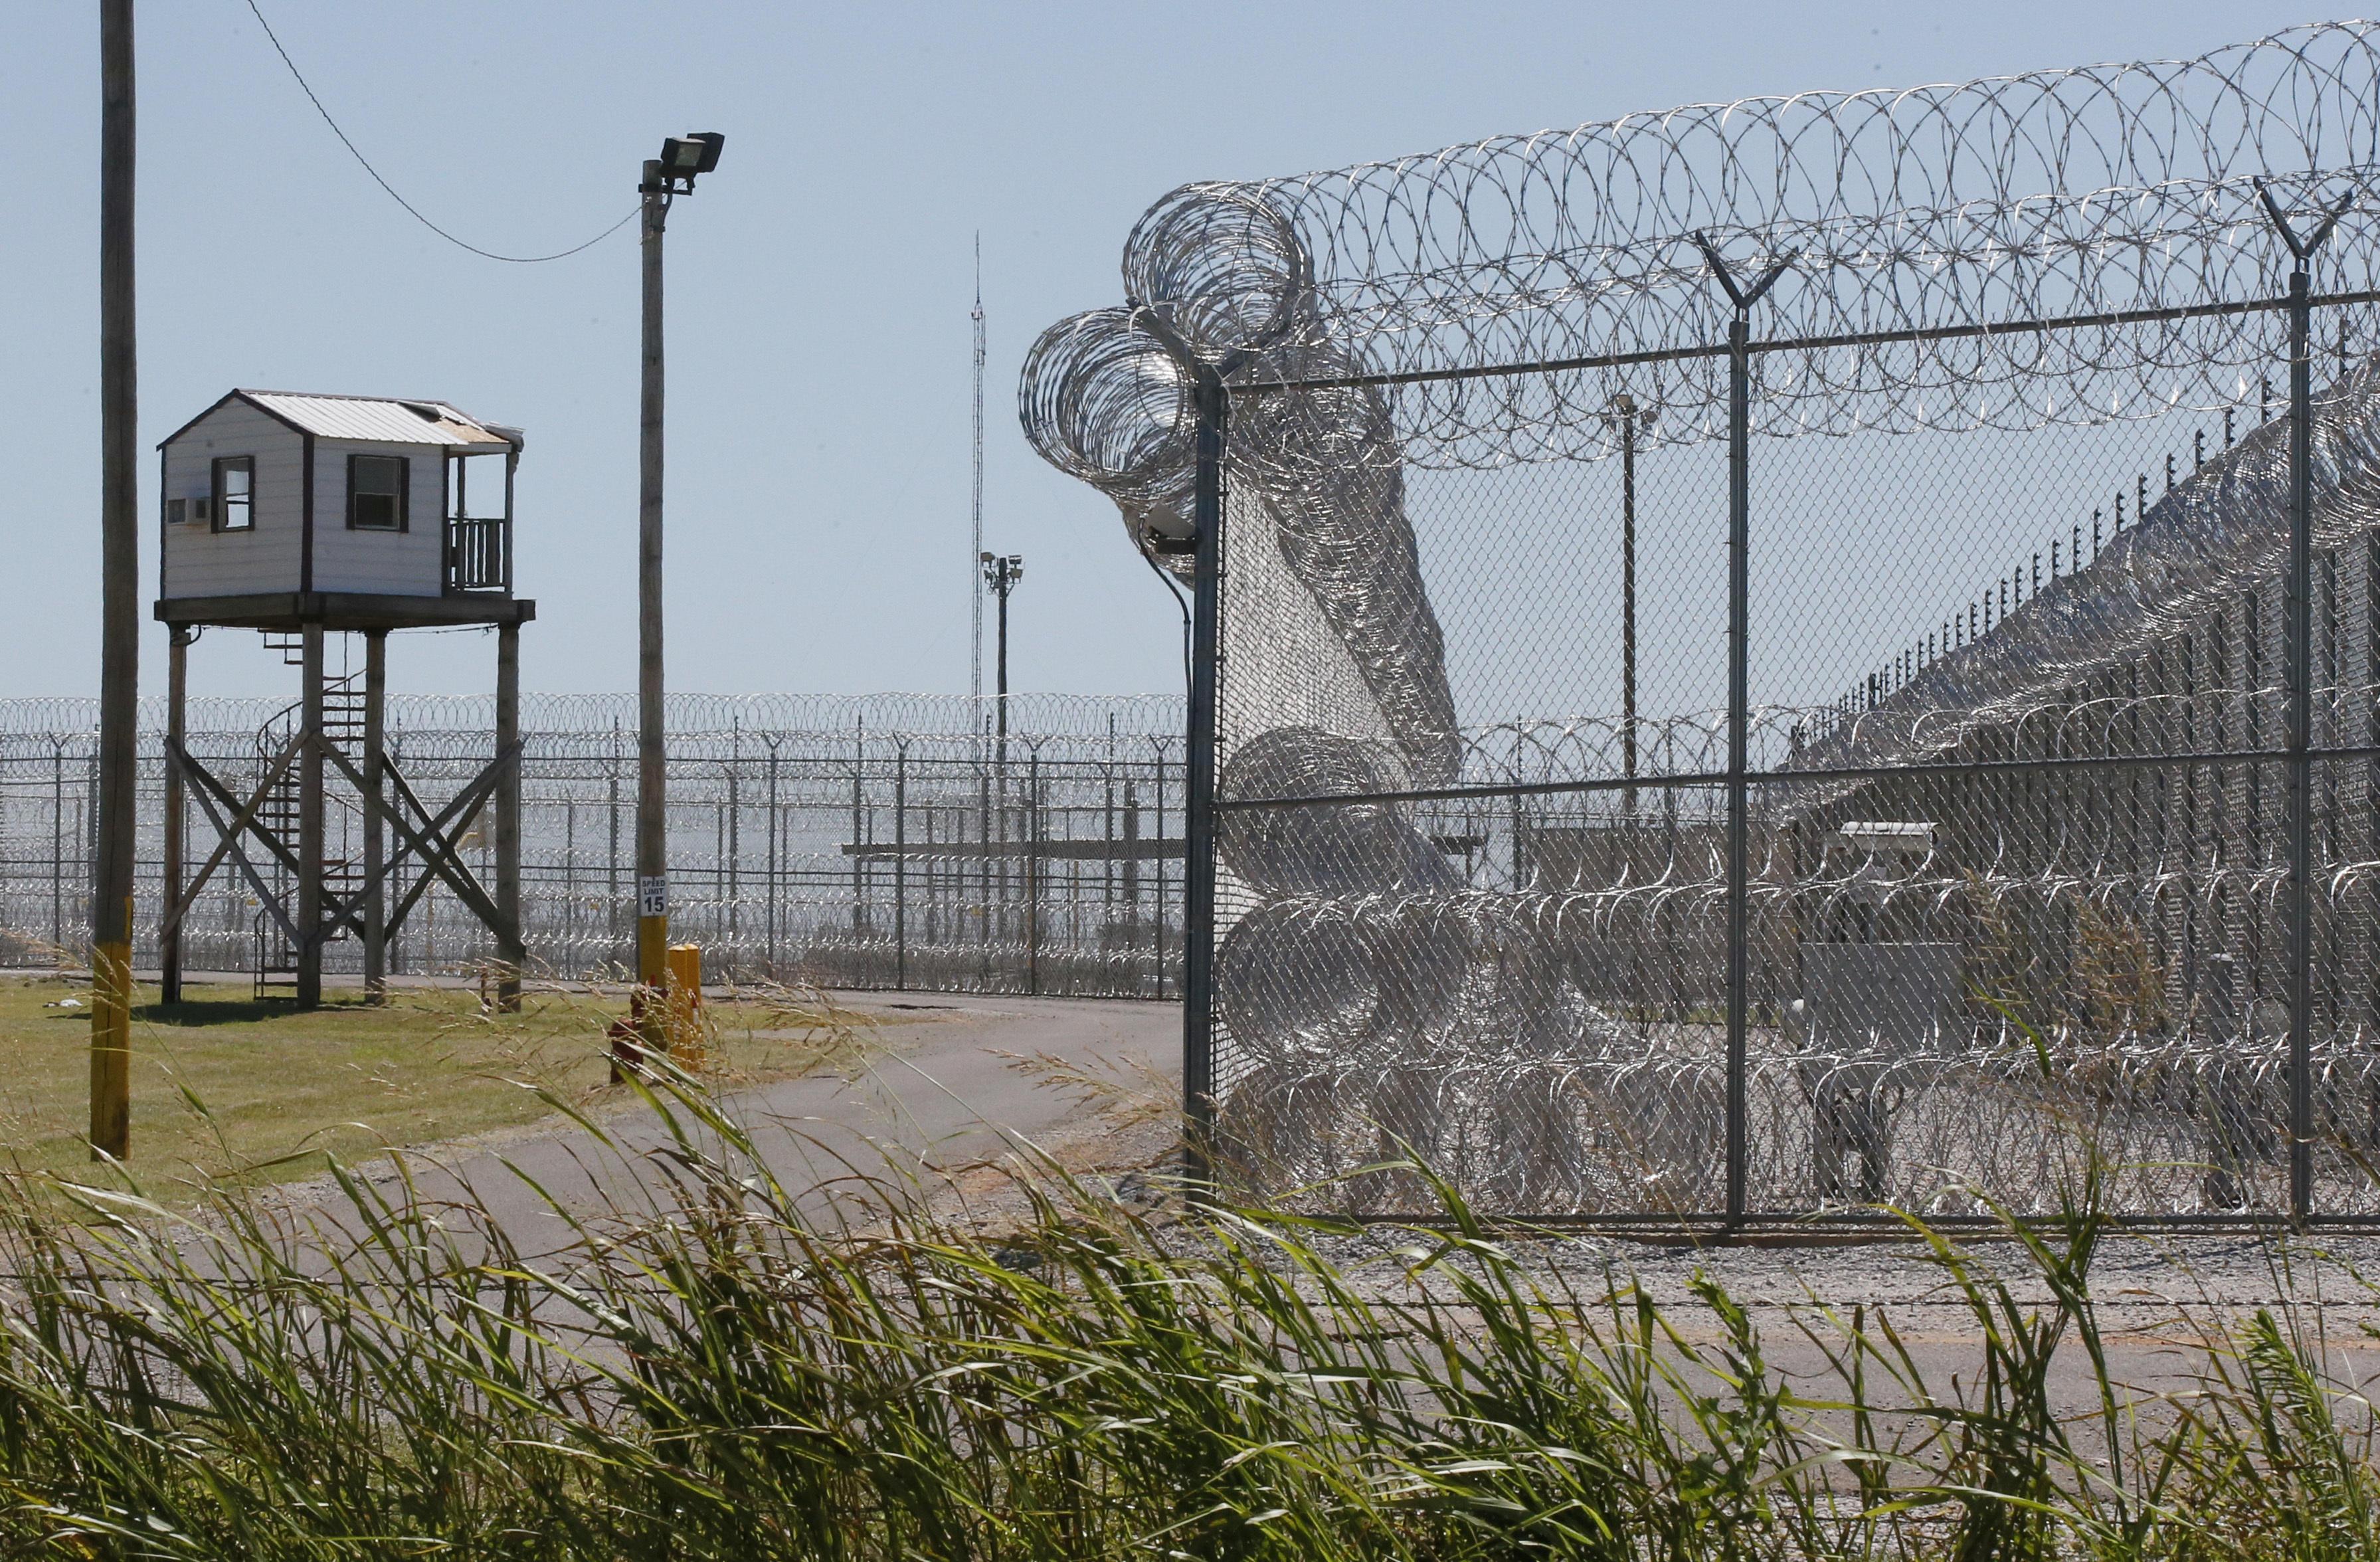 Inmates Take Guards Hostage In Oklahoma Prison Riot